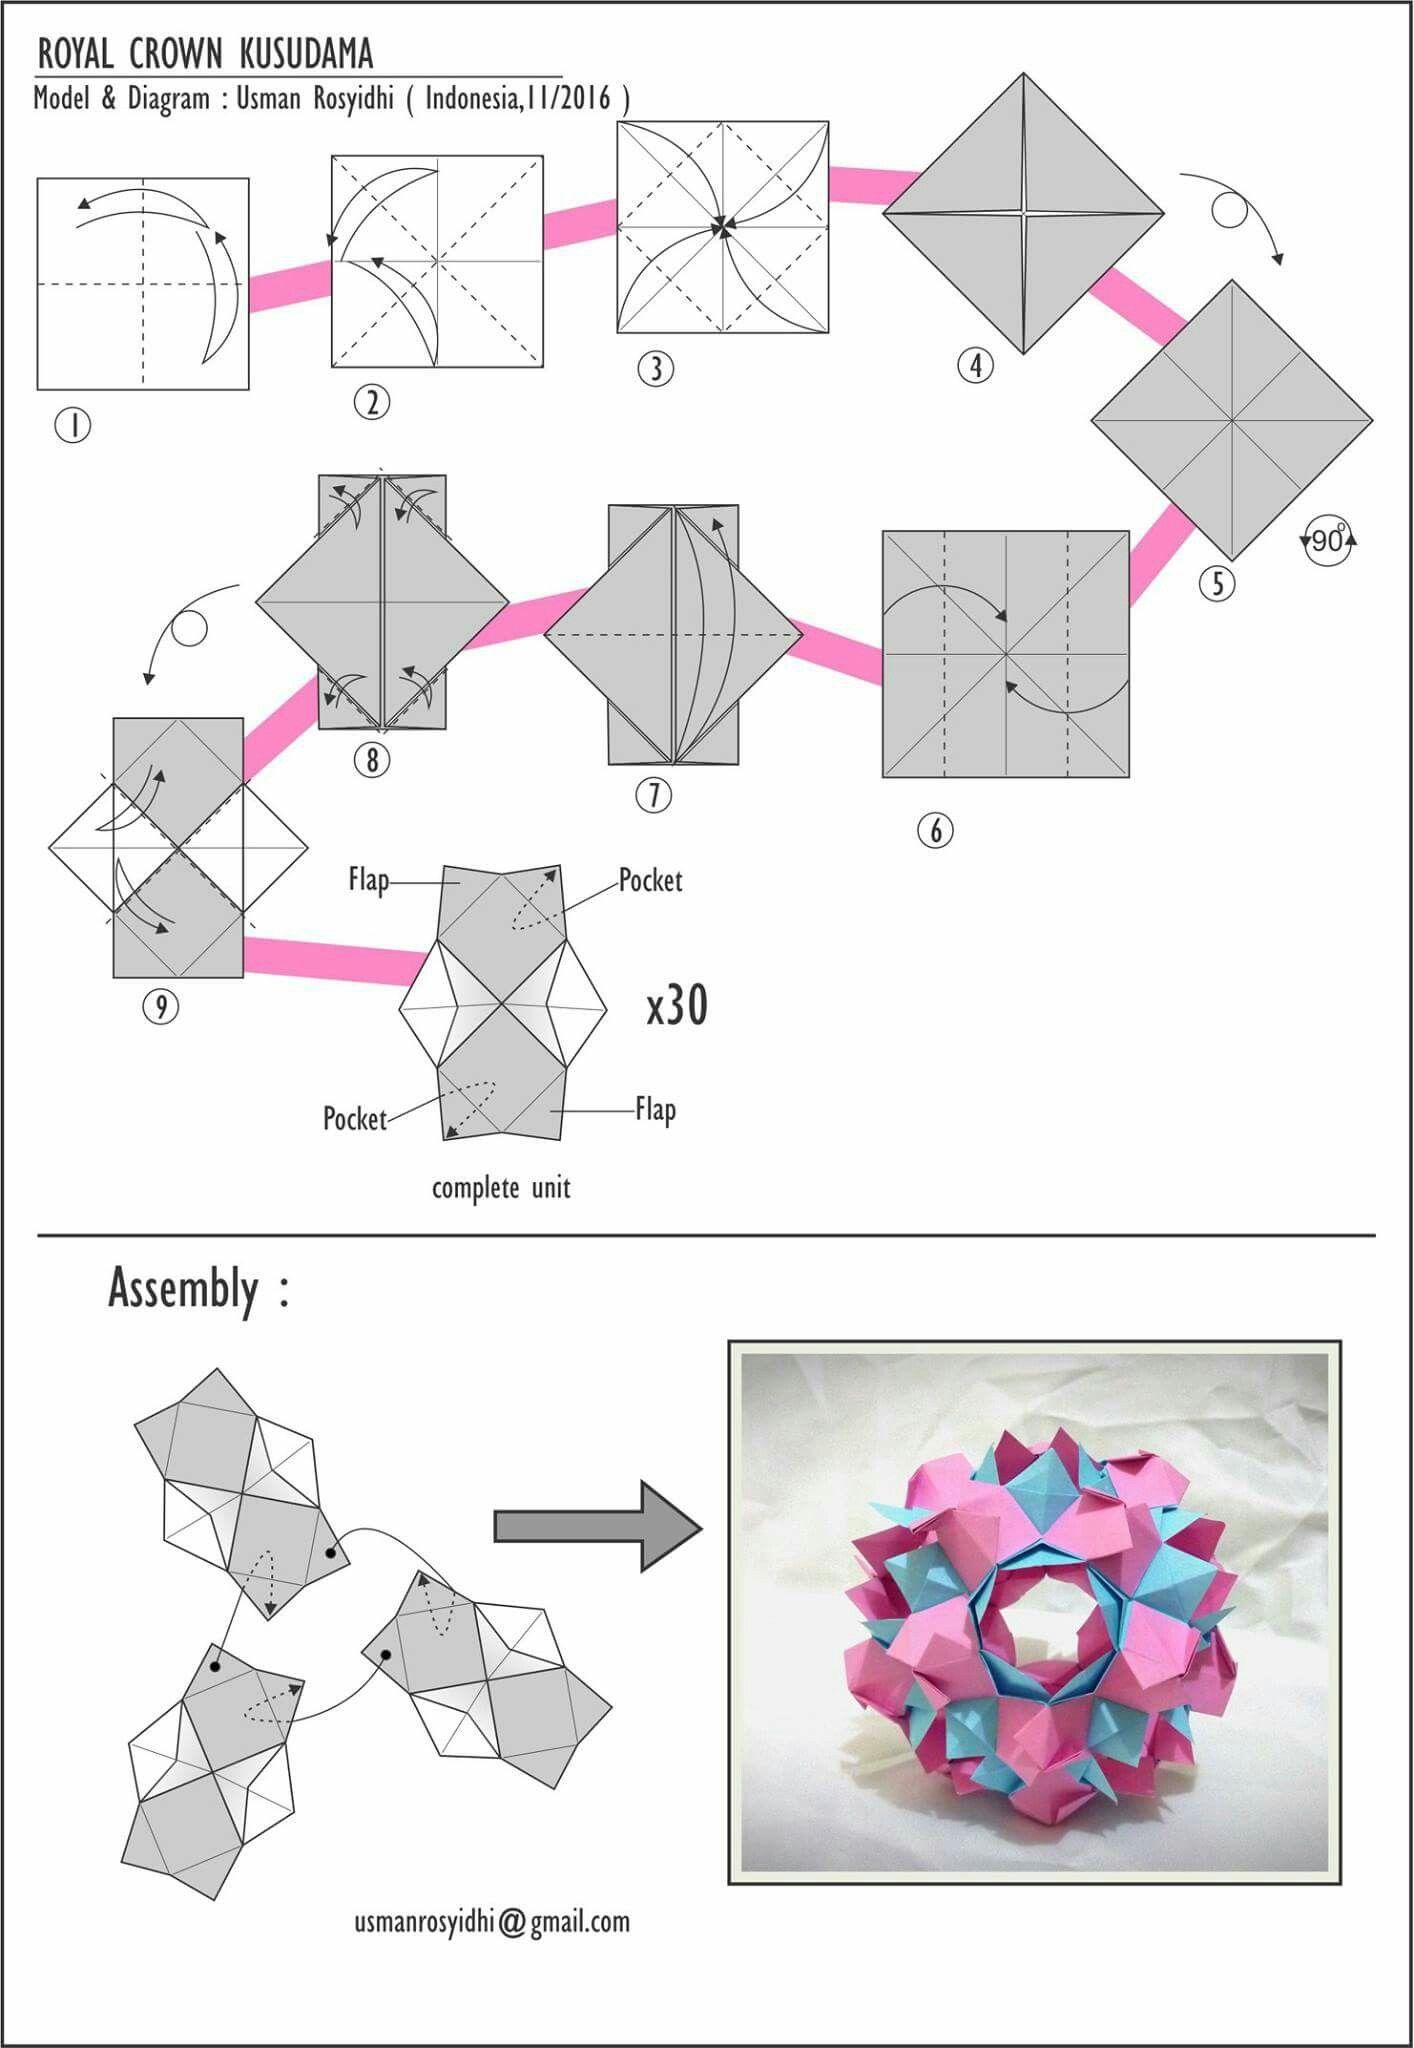 Pin By Tetenka On Kusudamas Pinterest Origami Modular 3d Diagrams Folding Craft Projects Ideas Paper